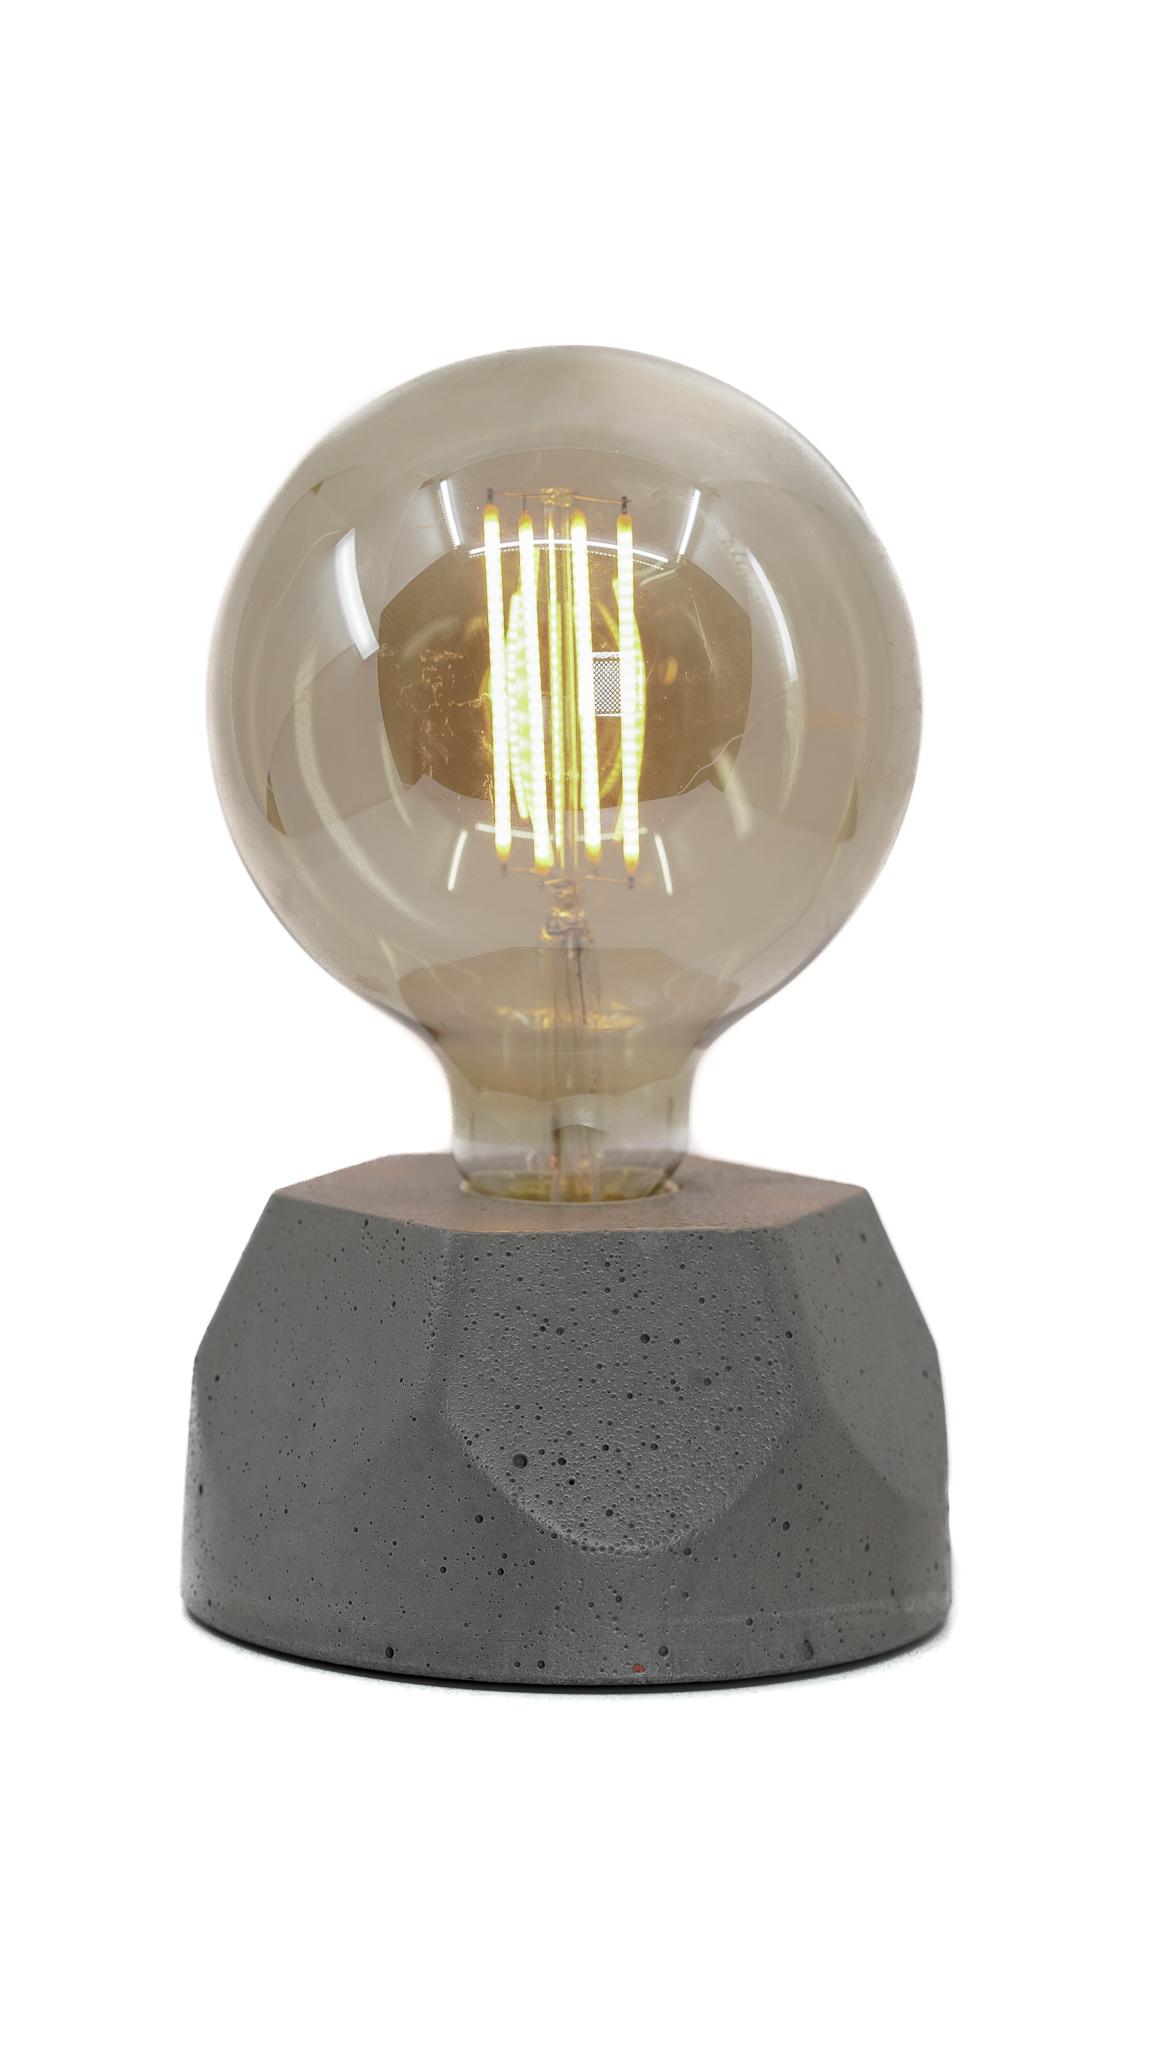 Lampe hexagone en béton gris fabrication artisanale